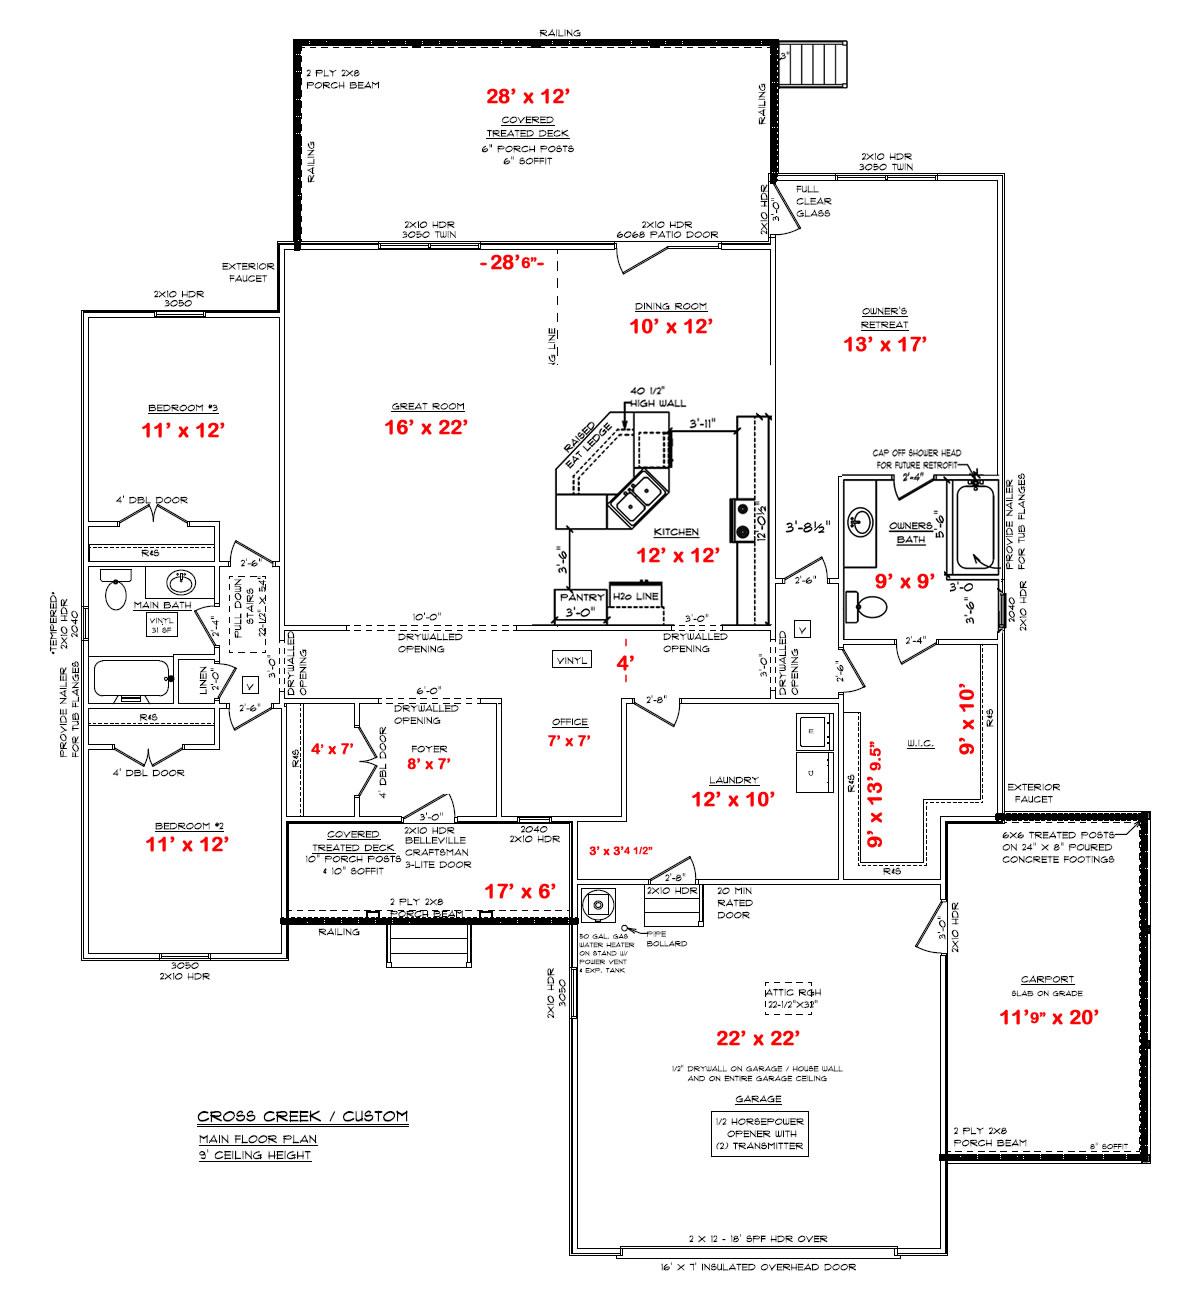 Building Our New Schumacher Home Progress Report